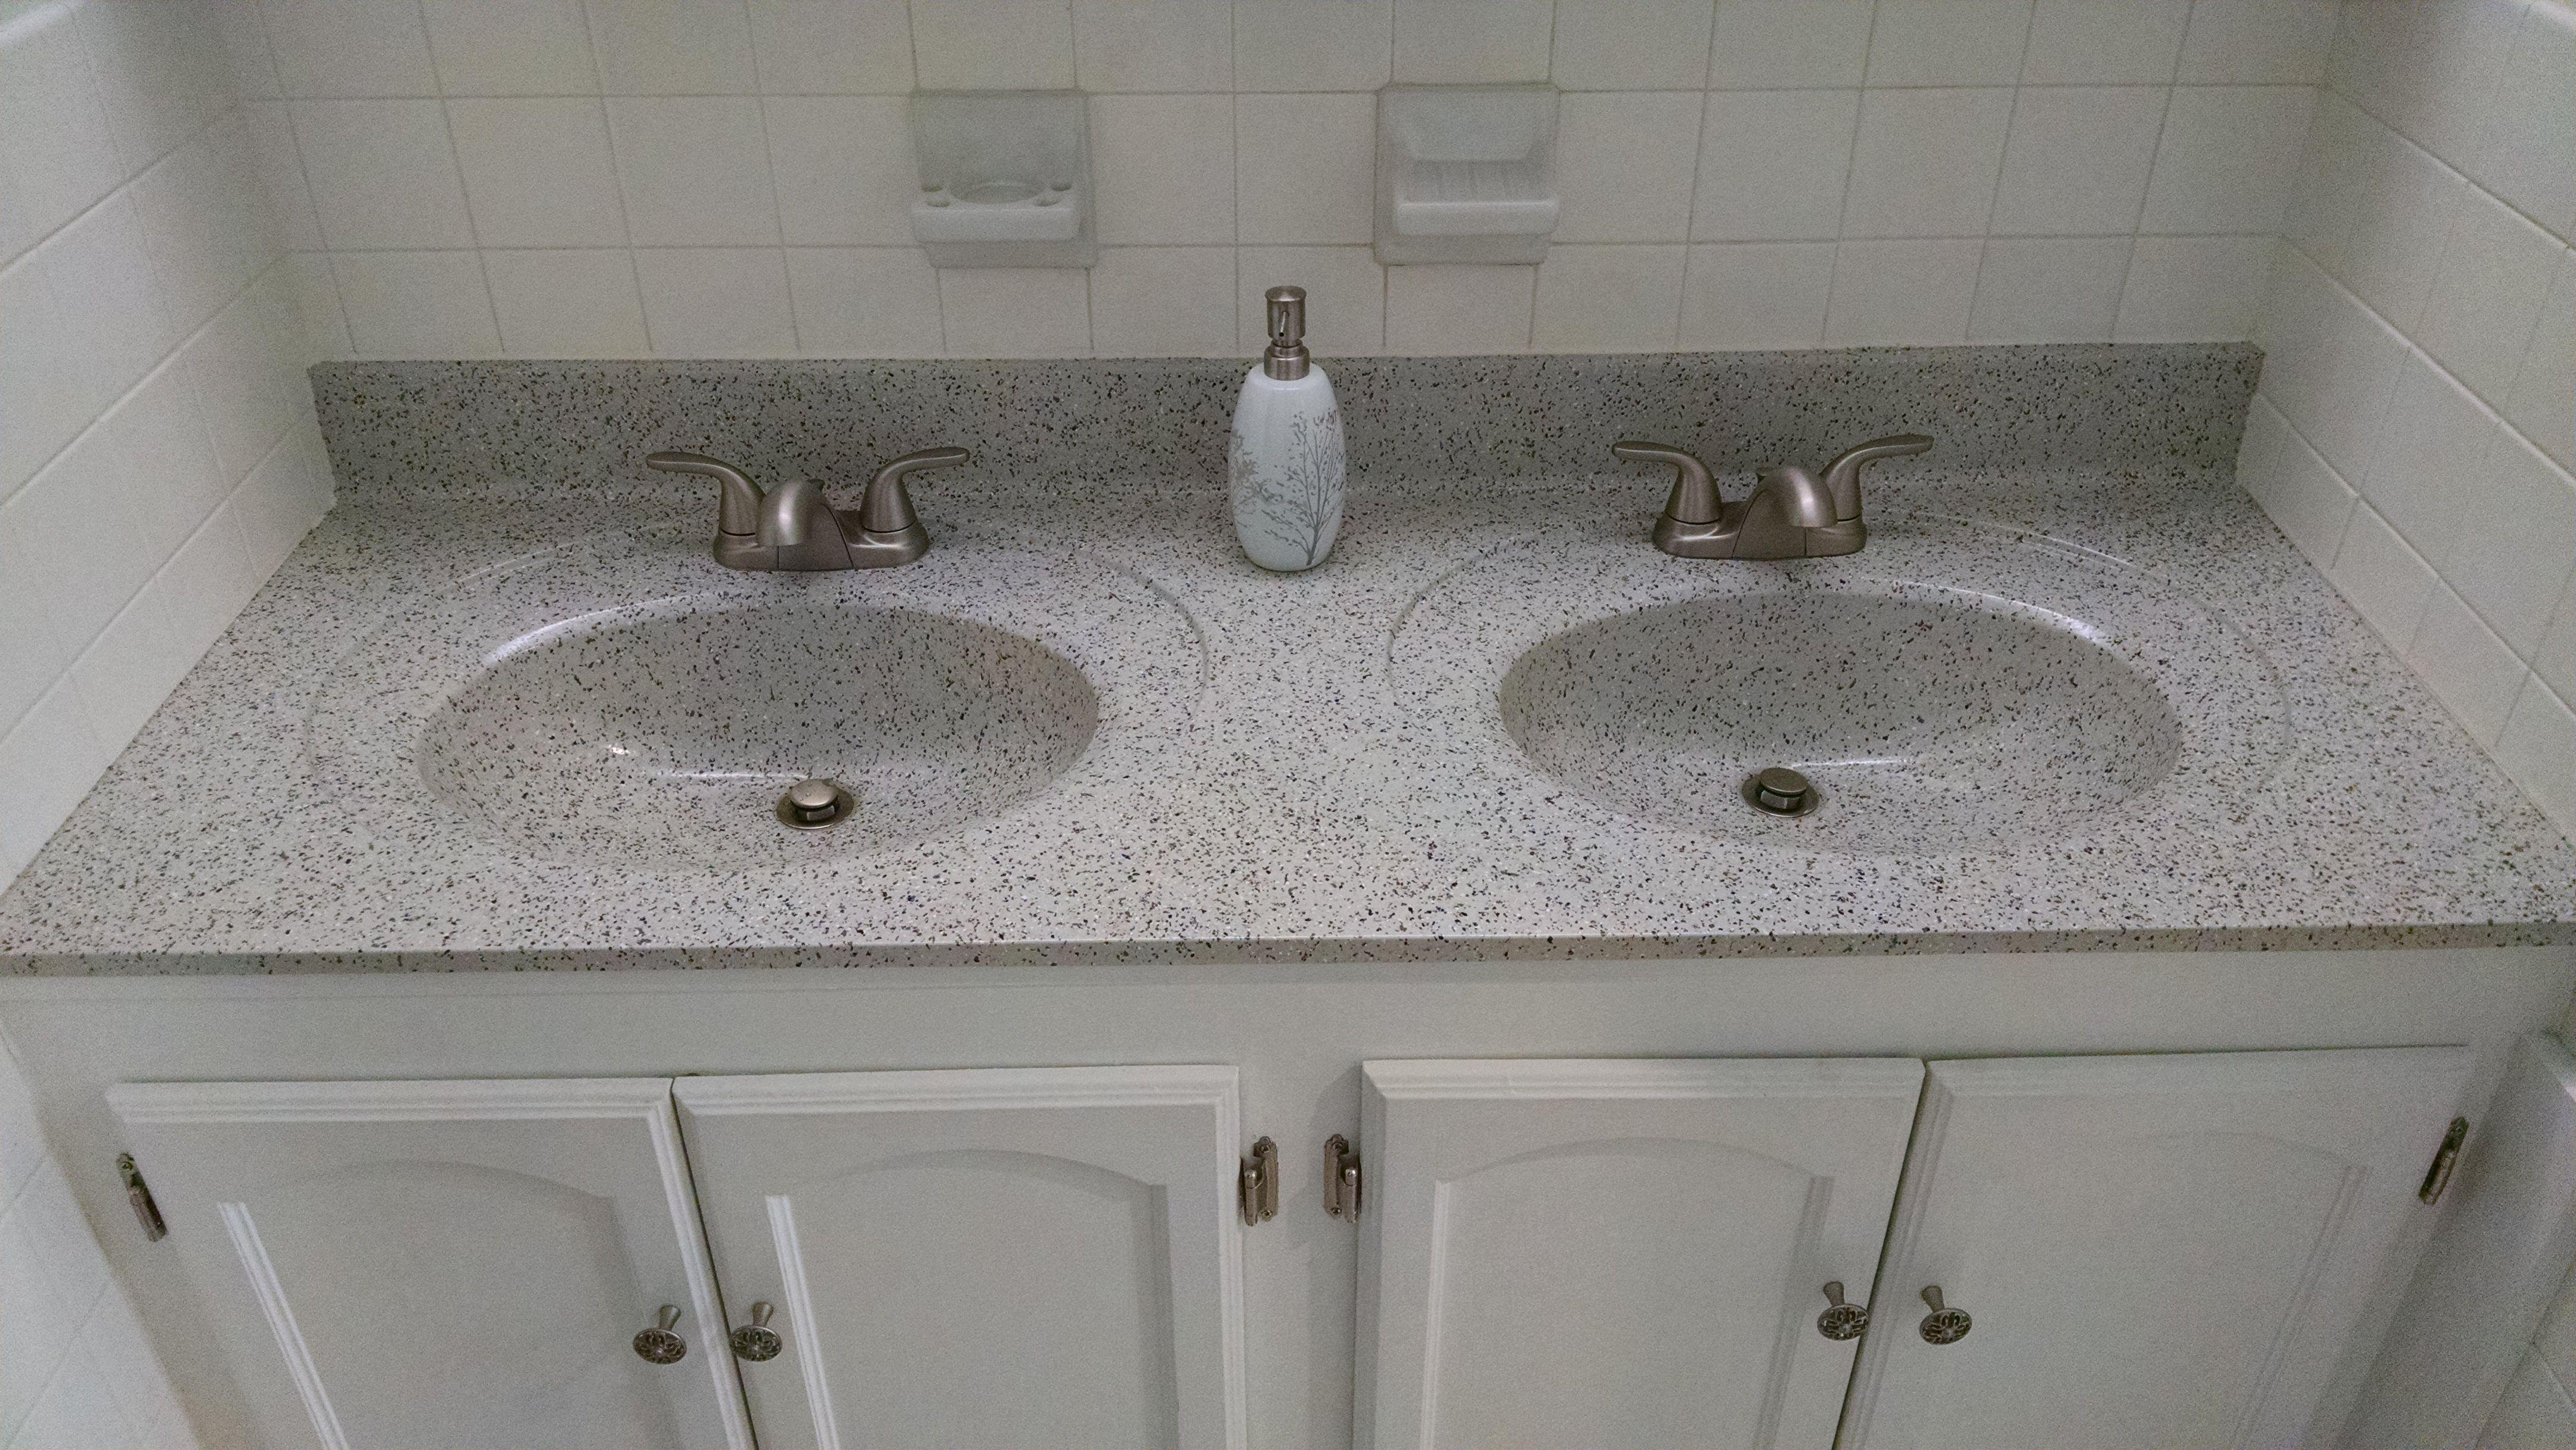 Rocky Road Bathroom Sink Countertop Glaze Moen Spot Resist